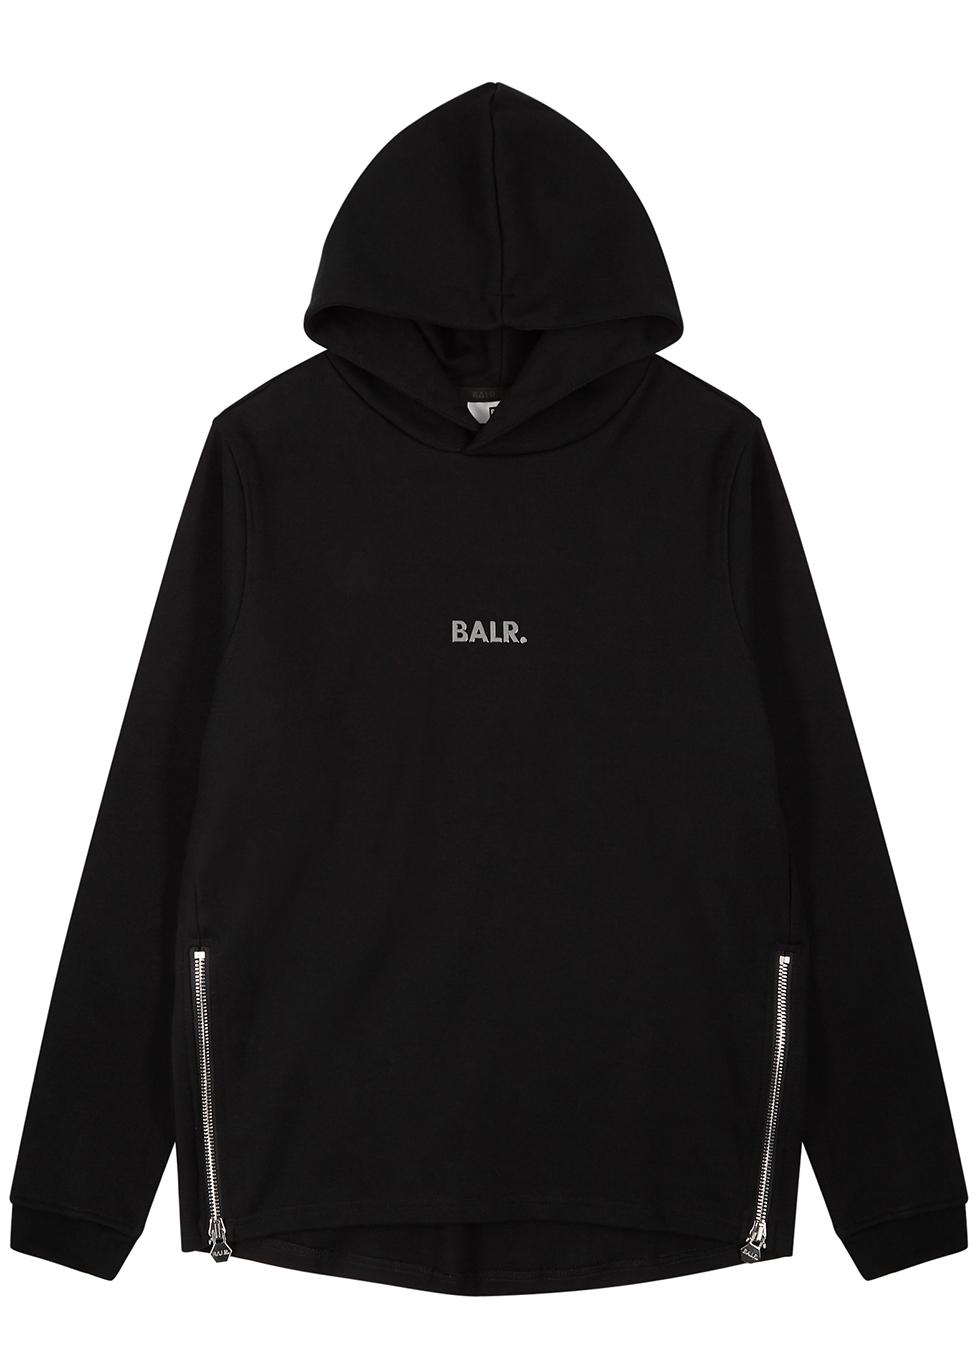 Q-Series black cotton-blend sweatshirt